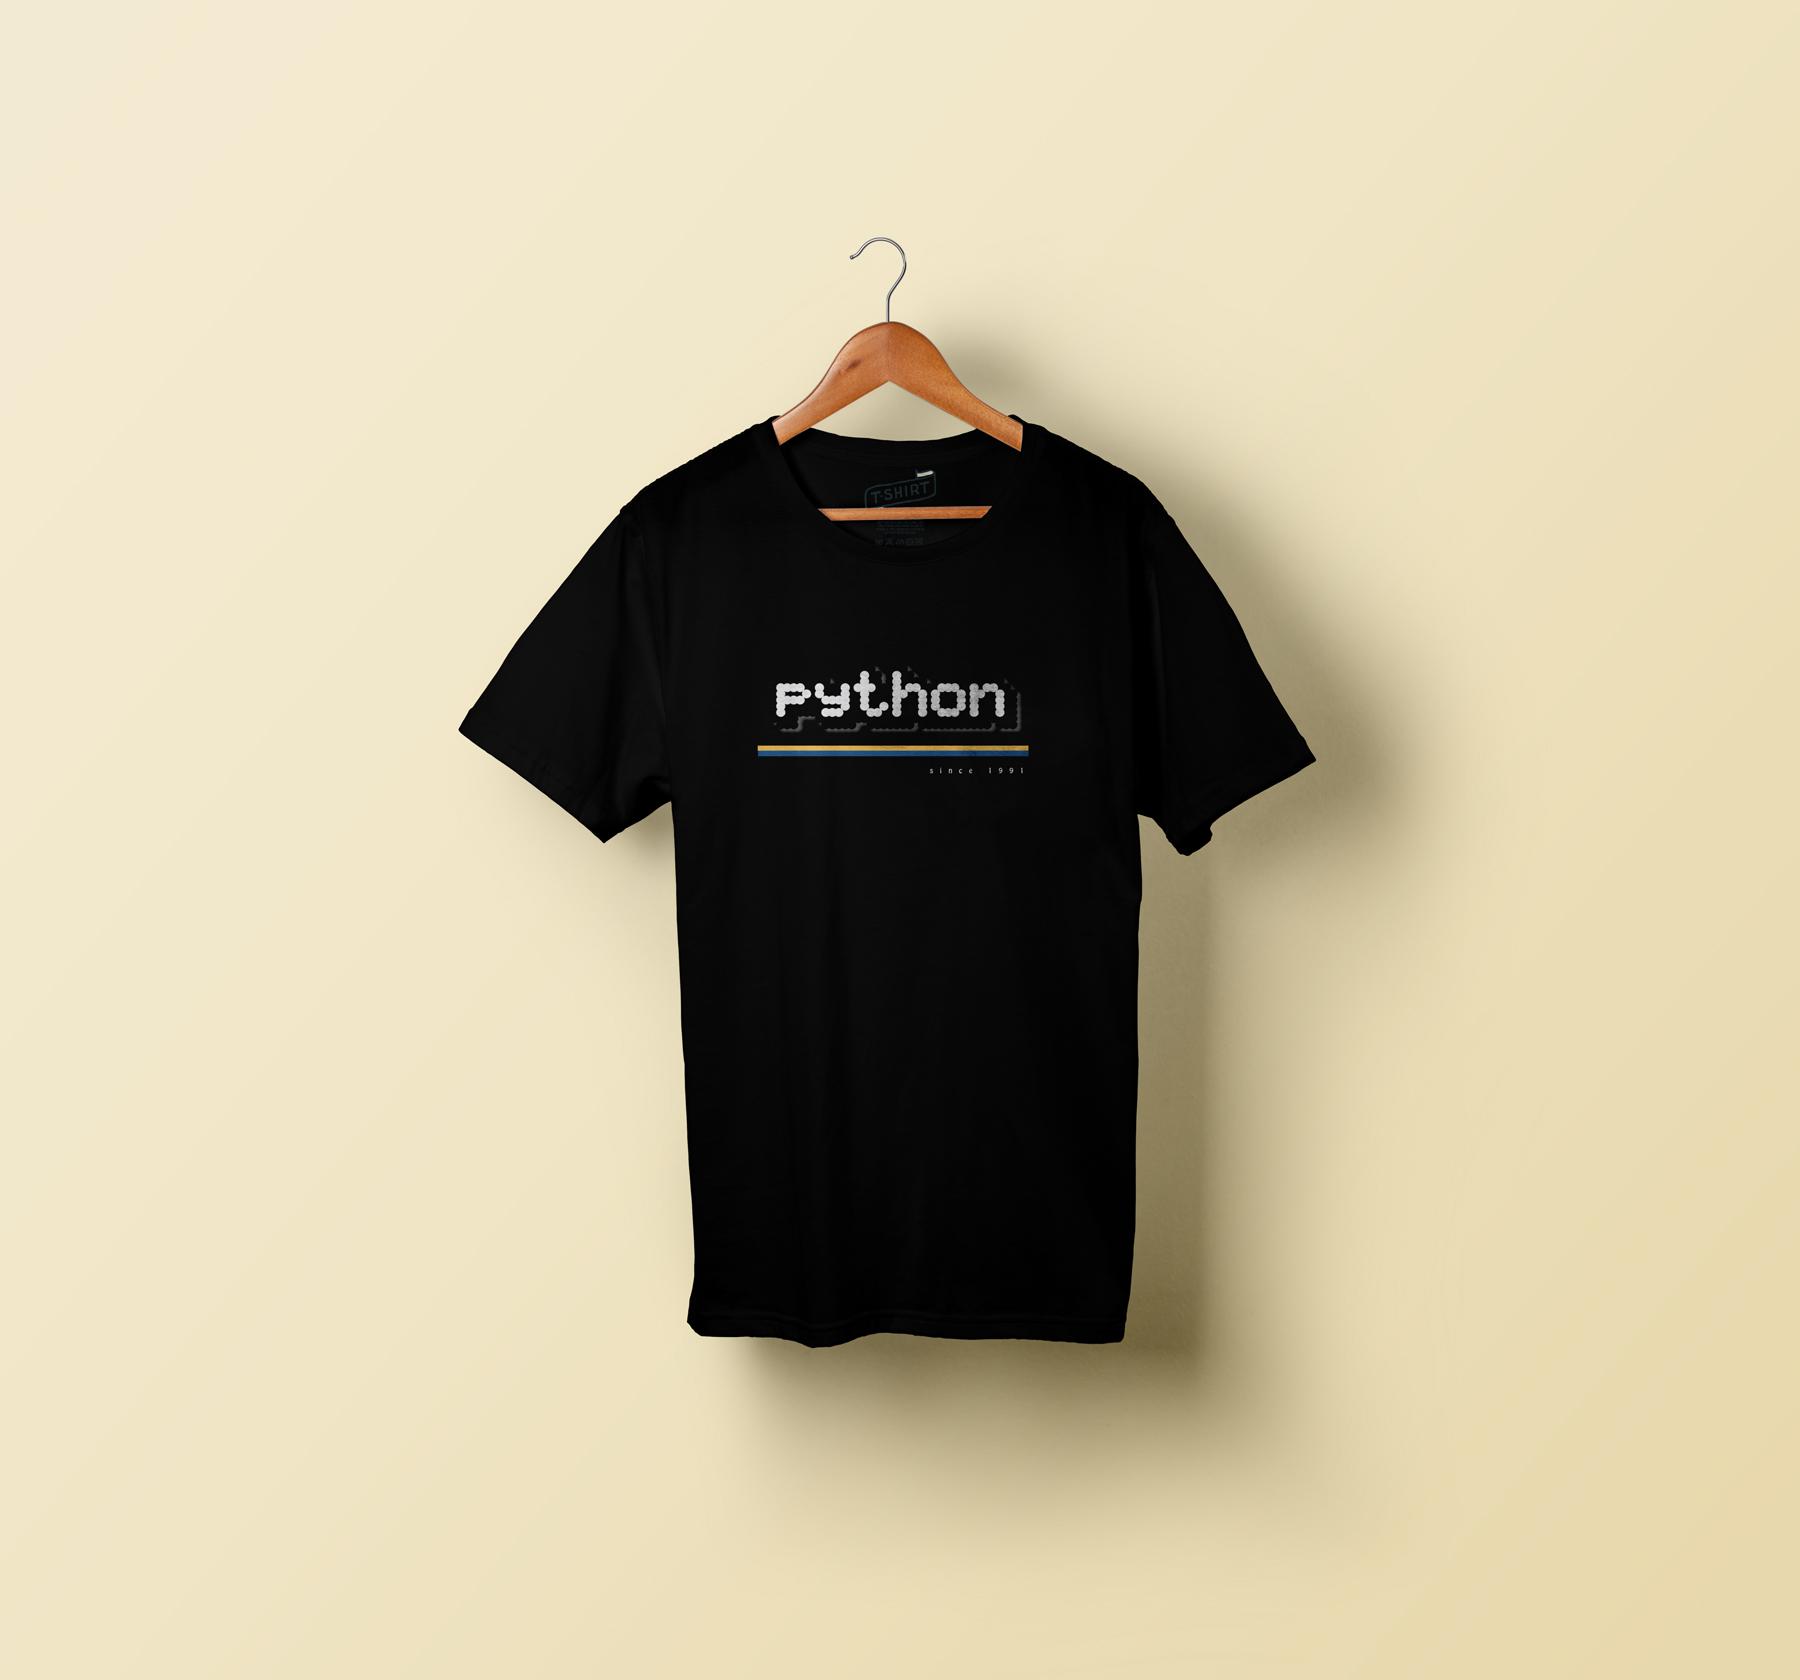 mock up of the pixel Python shirt design